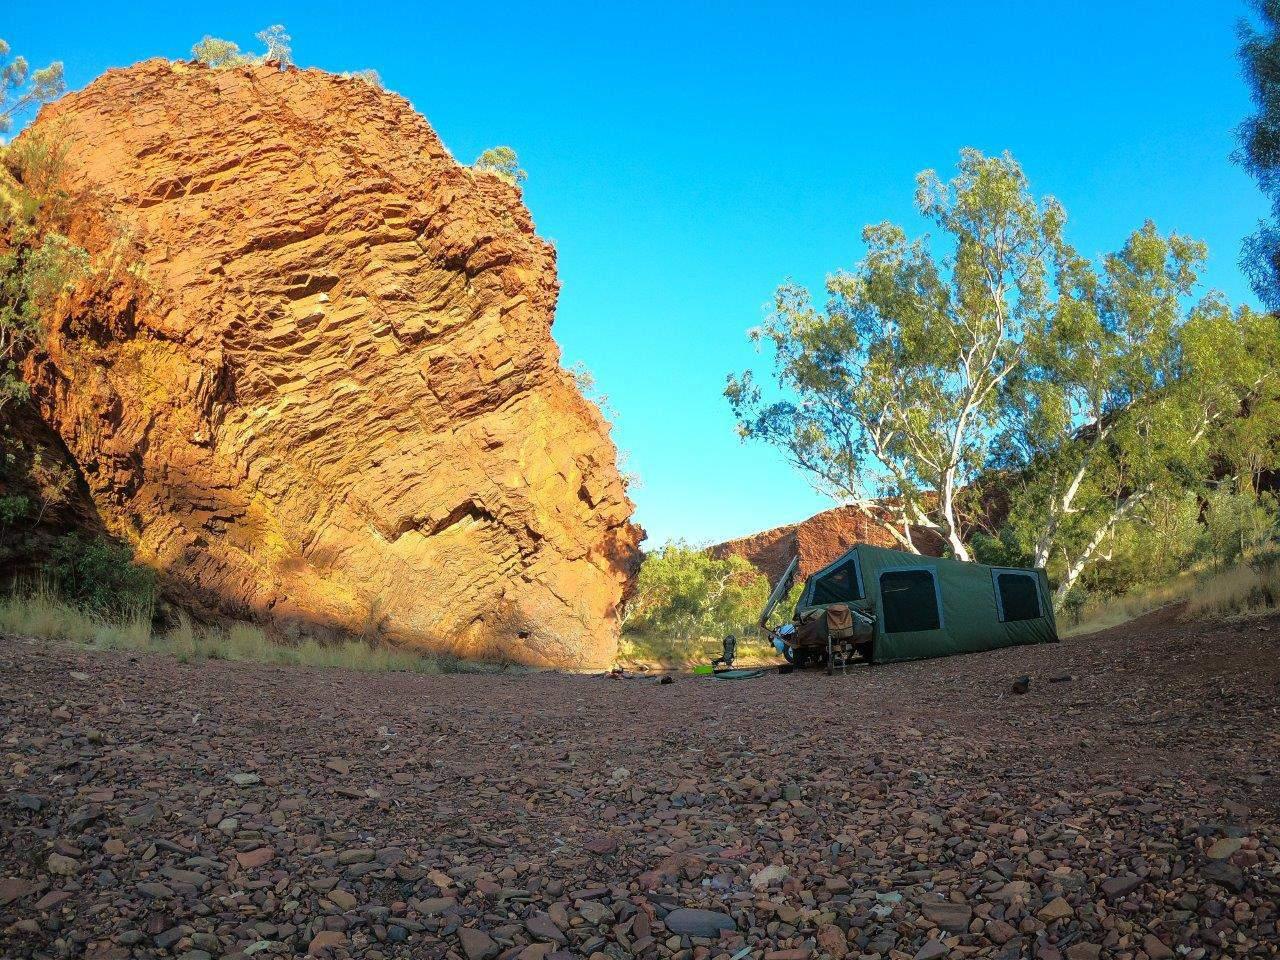 Newman camping